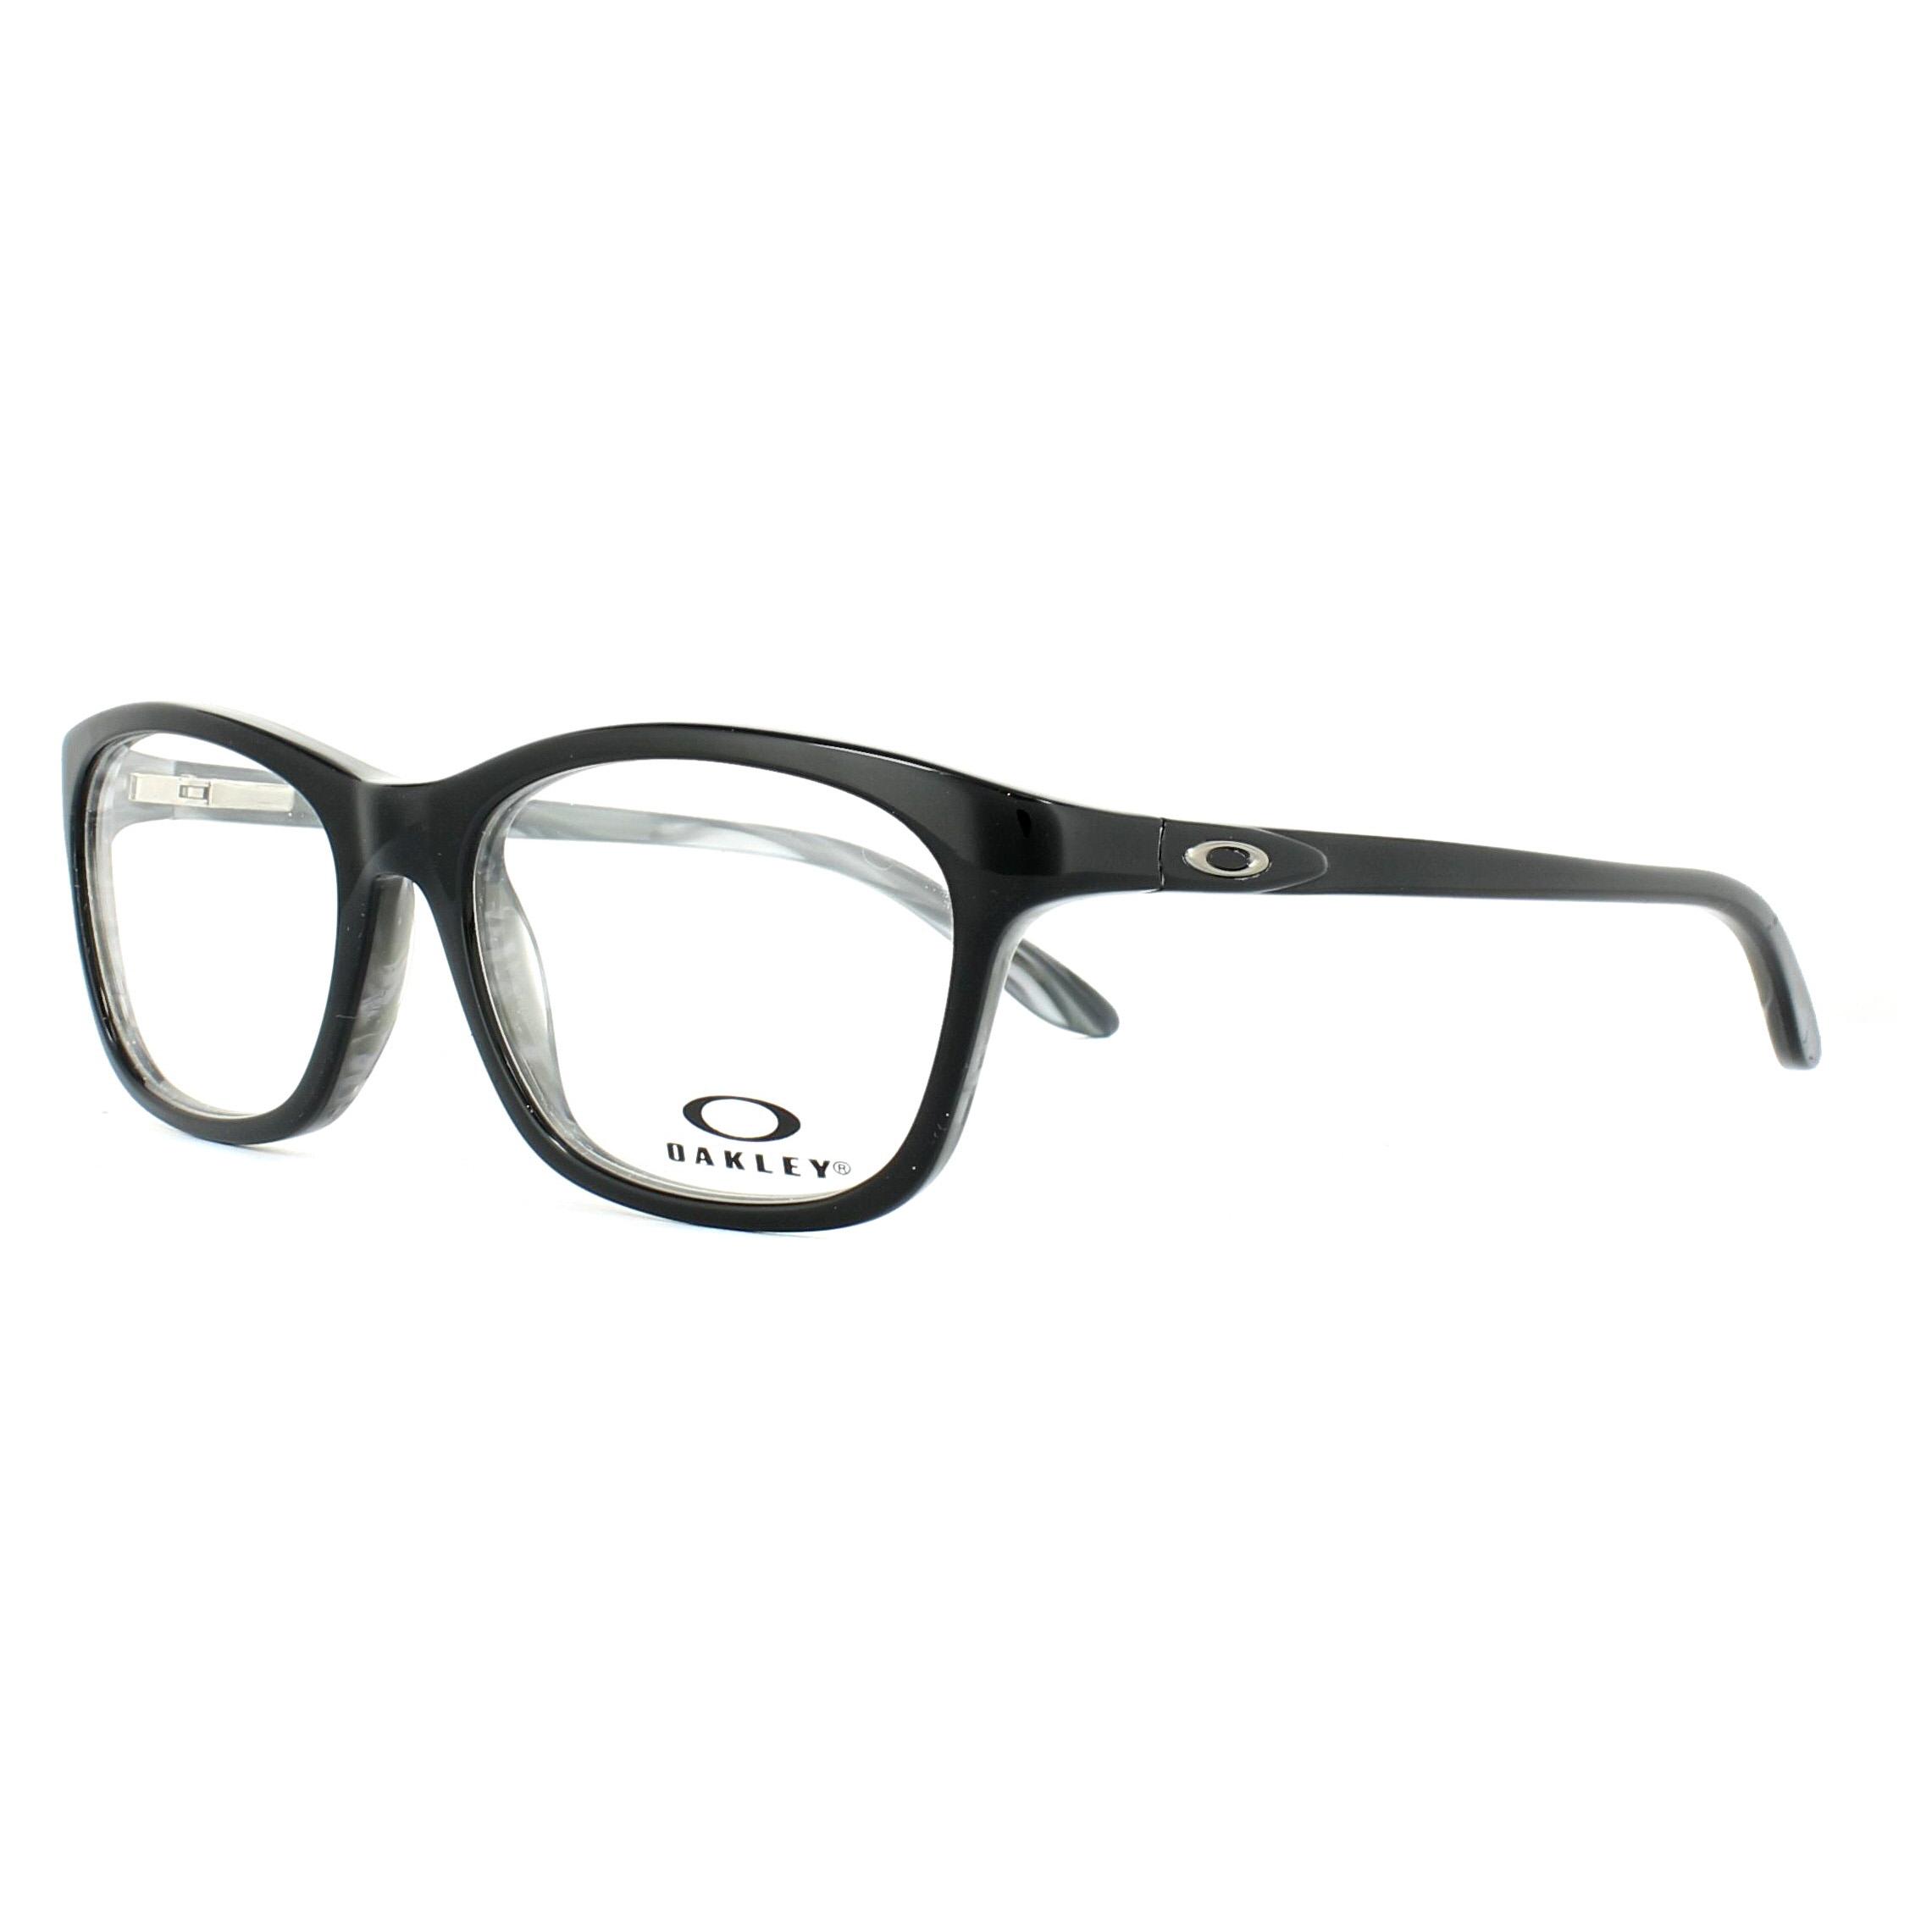 a87cf9219e10 Sentinel Oakley Glasses Frames Taunt OX1091-12 Black 50mm Womens